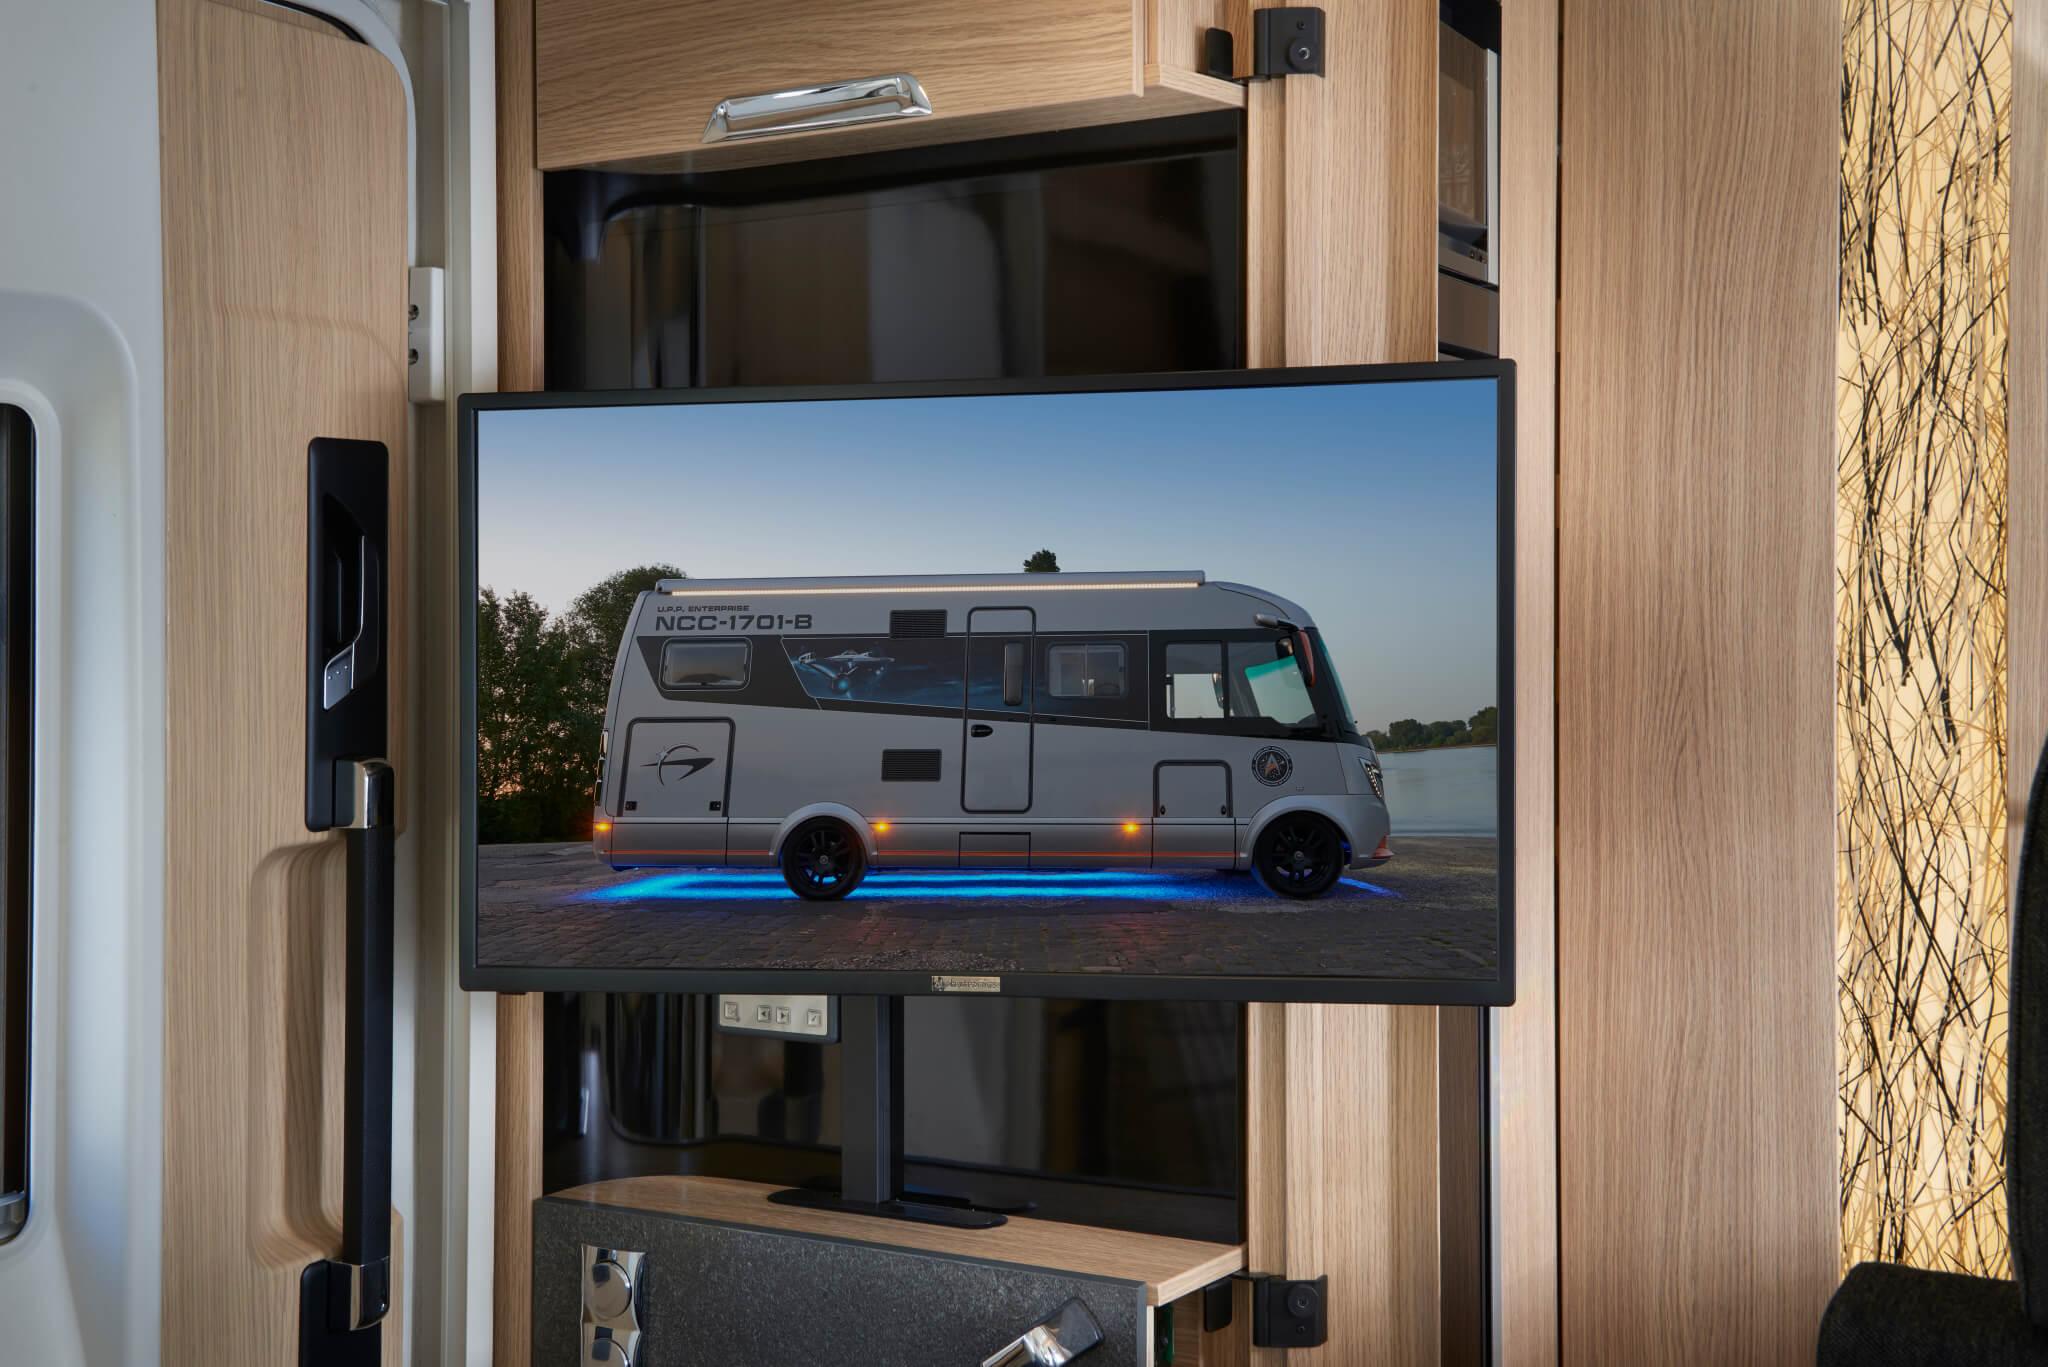 NIESMANN+BISCHOFF - Arto - Arto  82 E - 32 inch LED TV - television